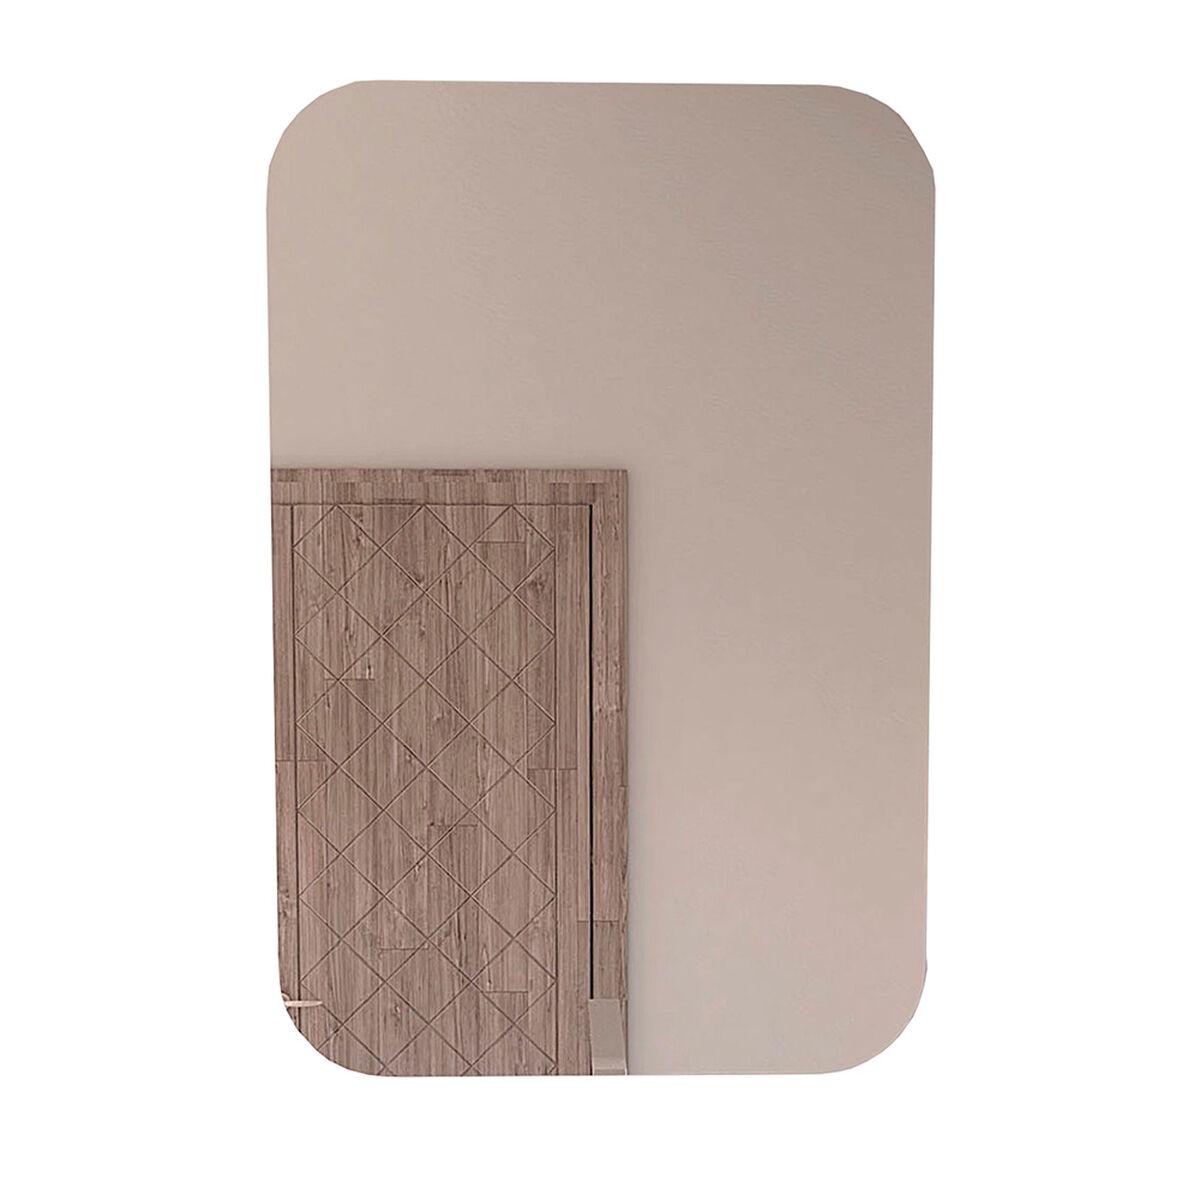 Espejo Pompei Sencillo Con Esquinas Ovaladas